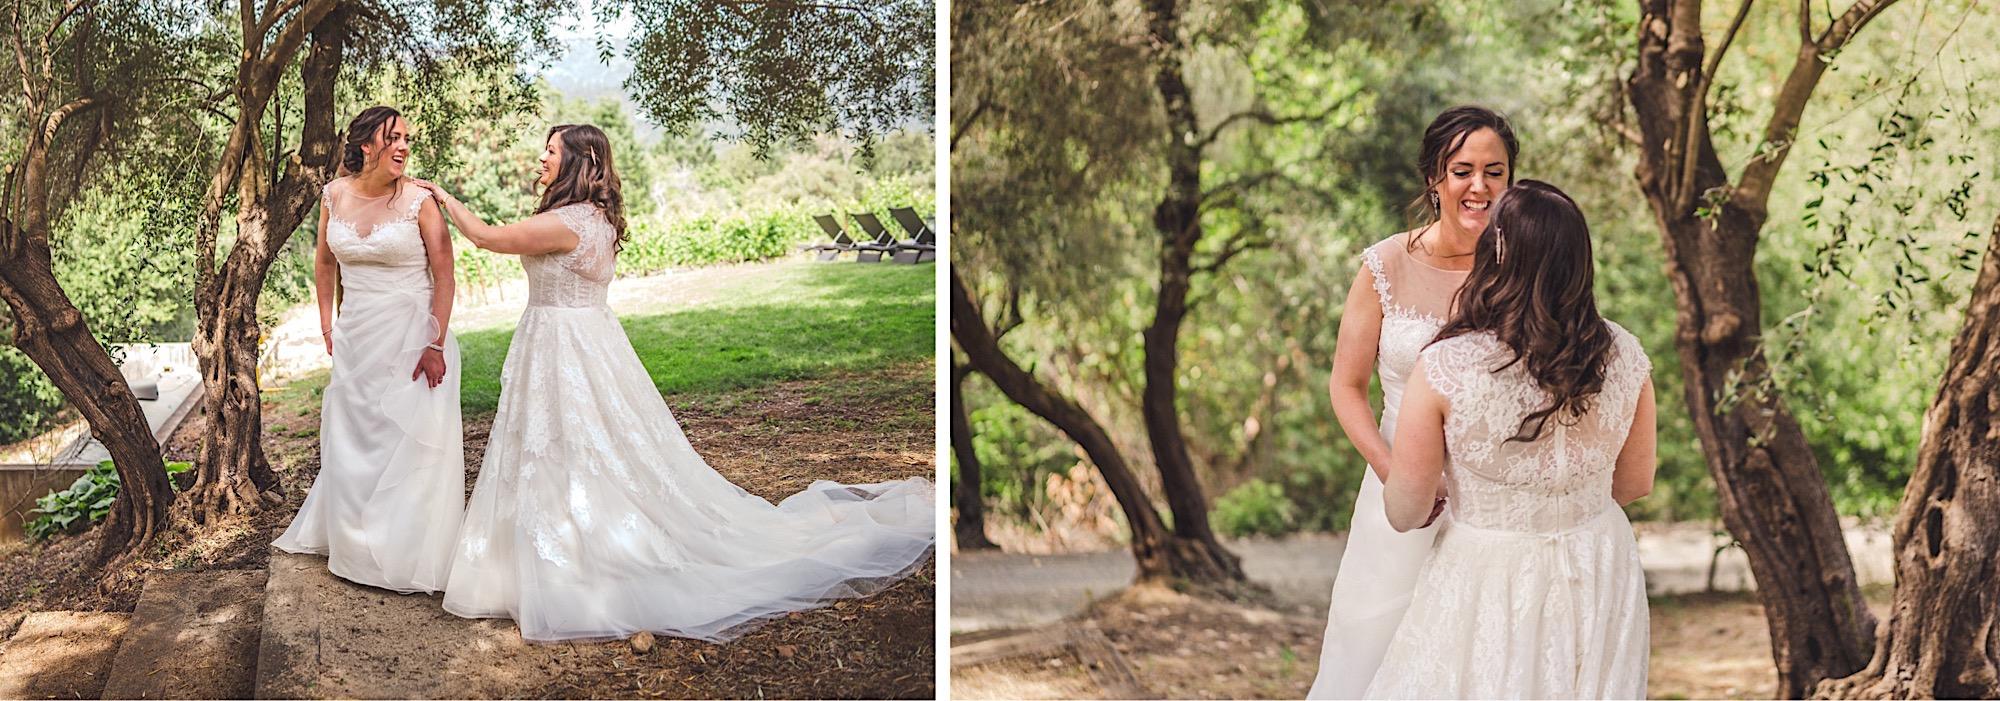 10_wedding_Napa_photographer.jpg